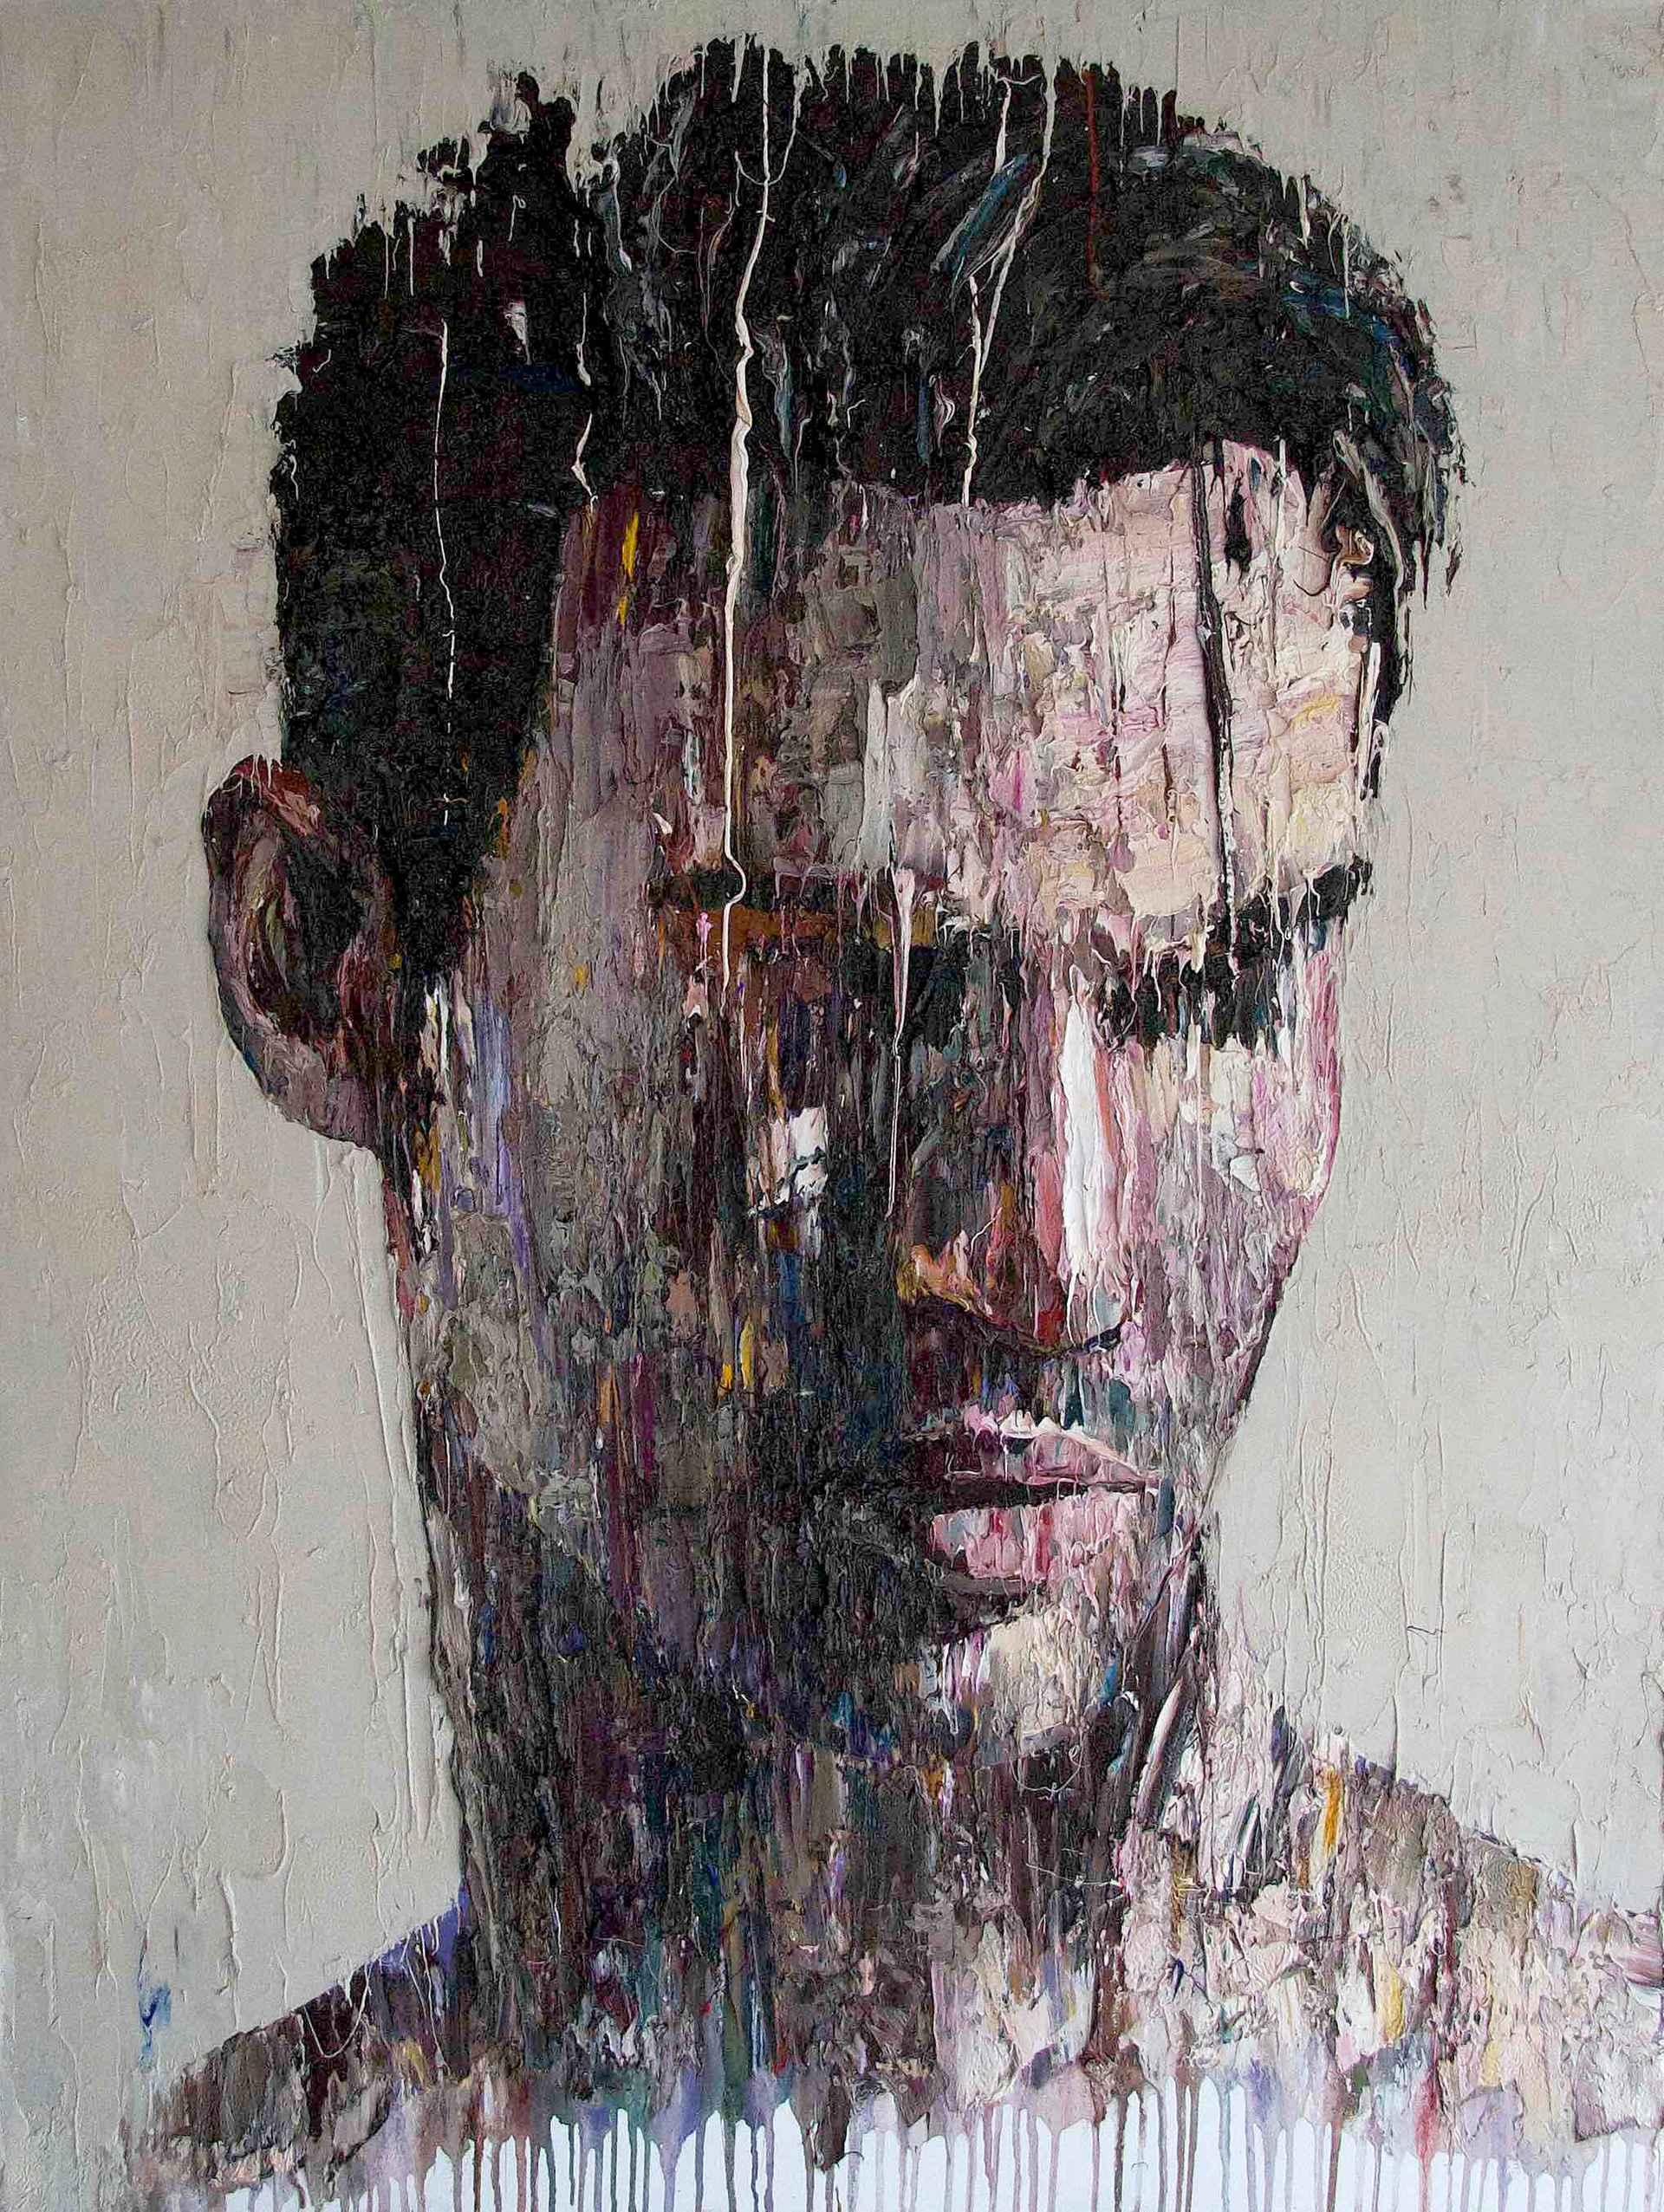 Abrafo by Carl Melegari